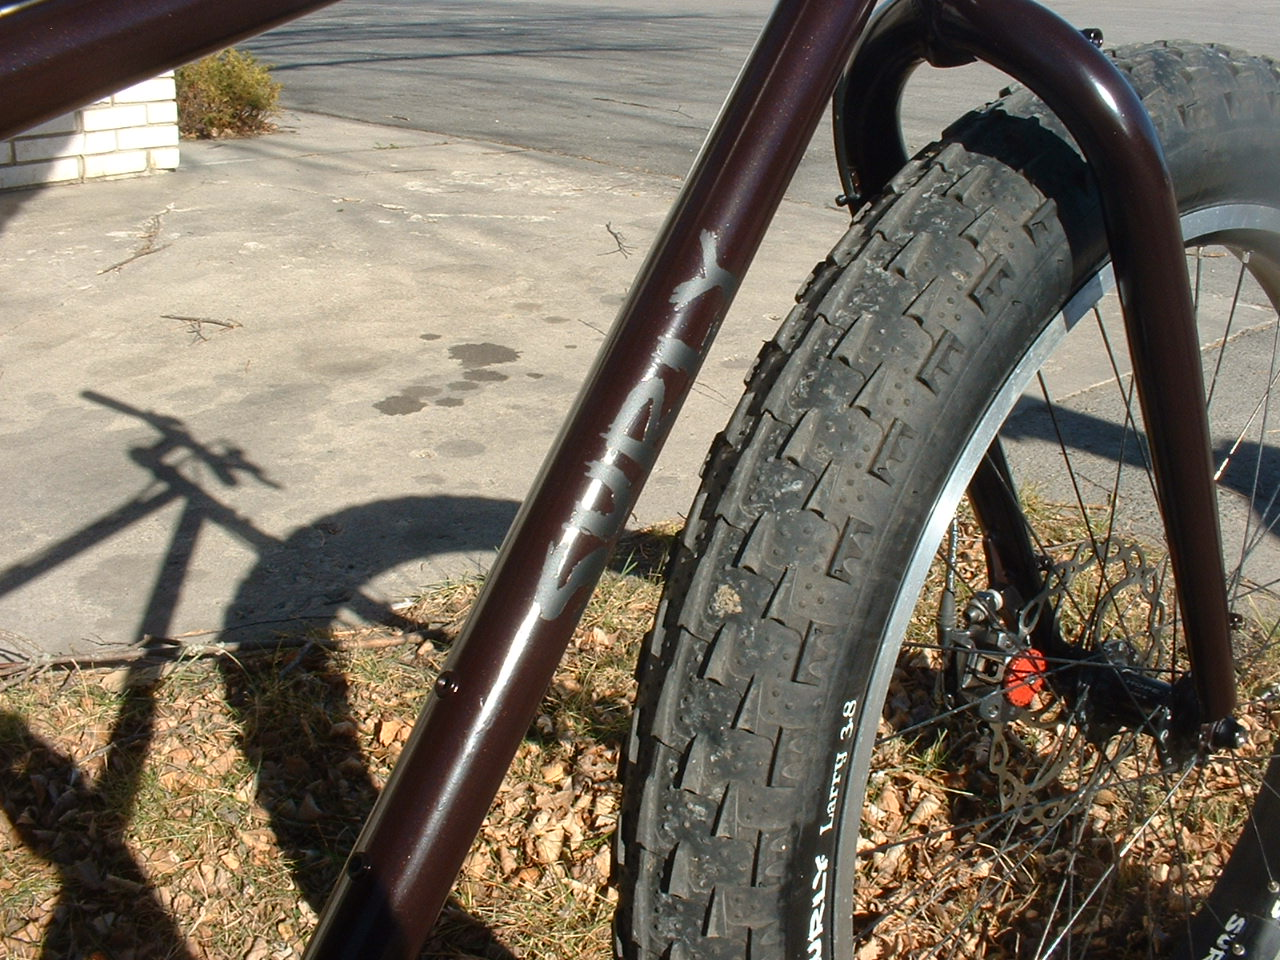 Daily fatbike pic thread-dscf0523.jpg